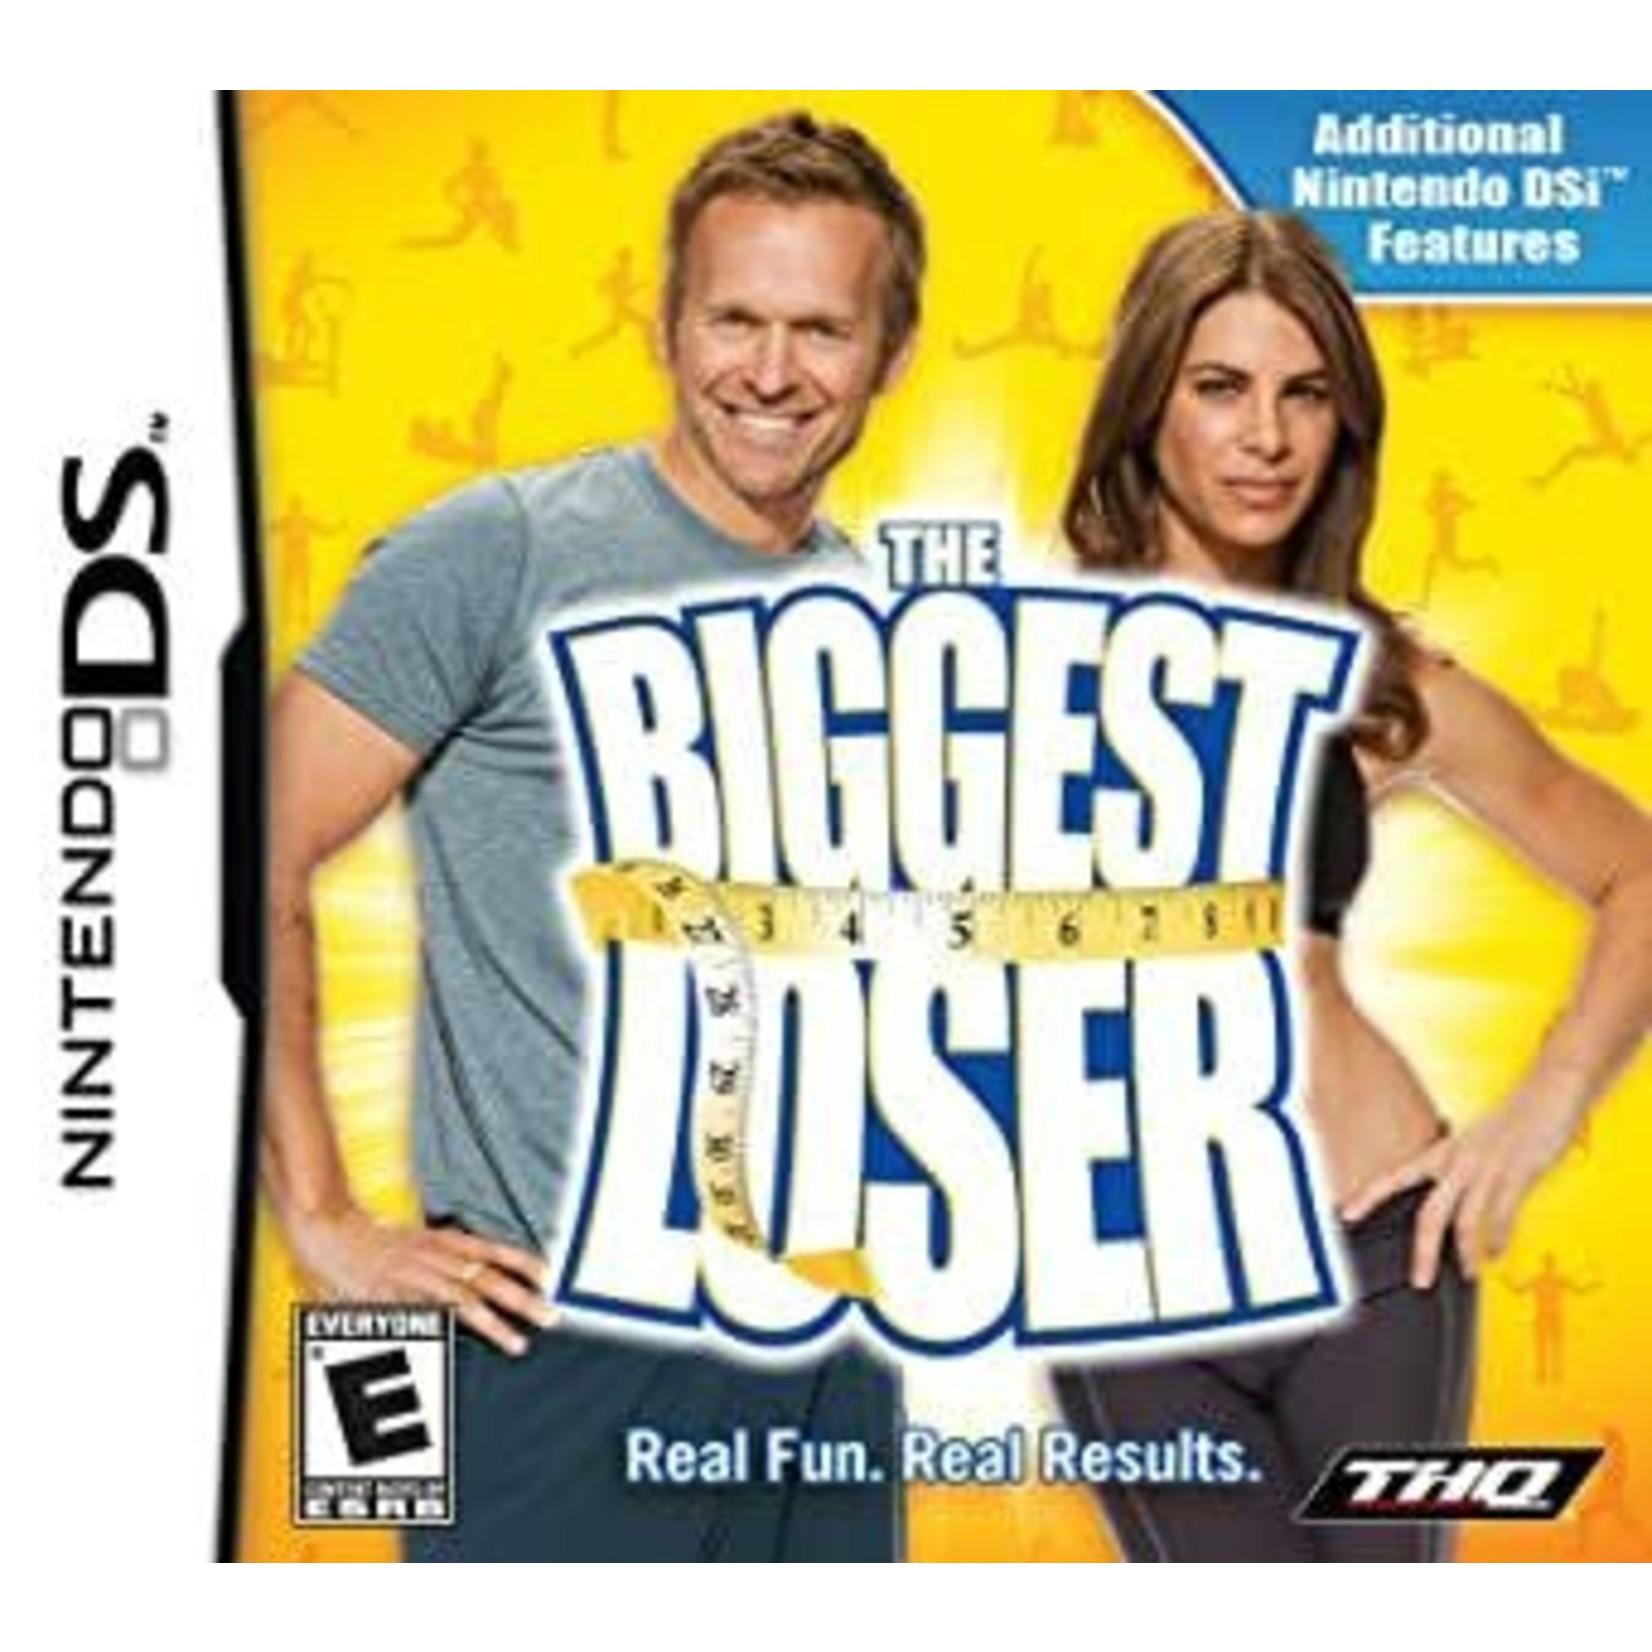 DS-The Biggest Loser